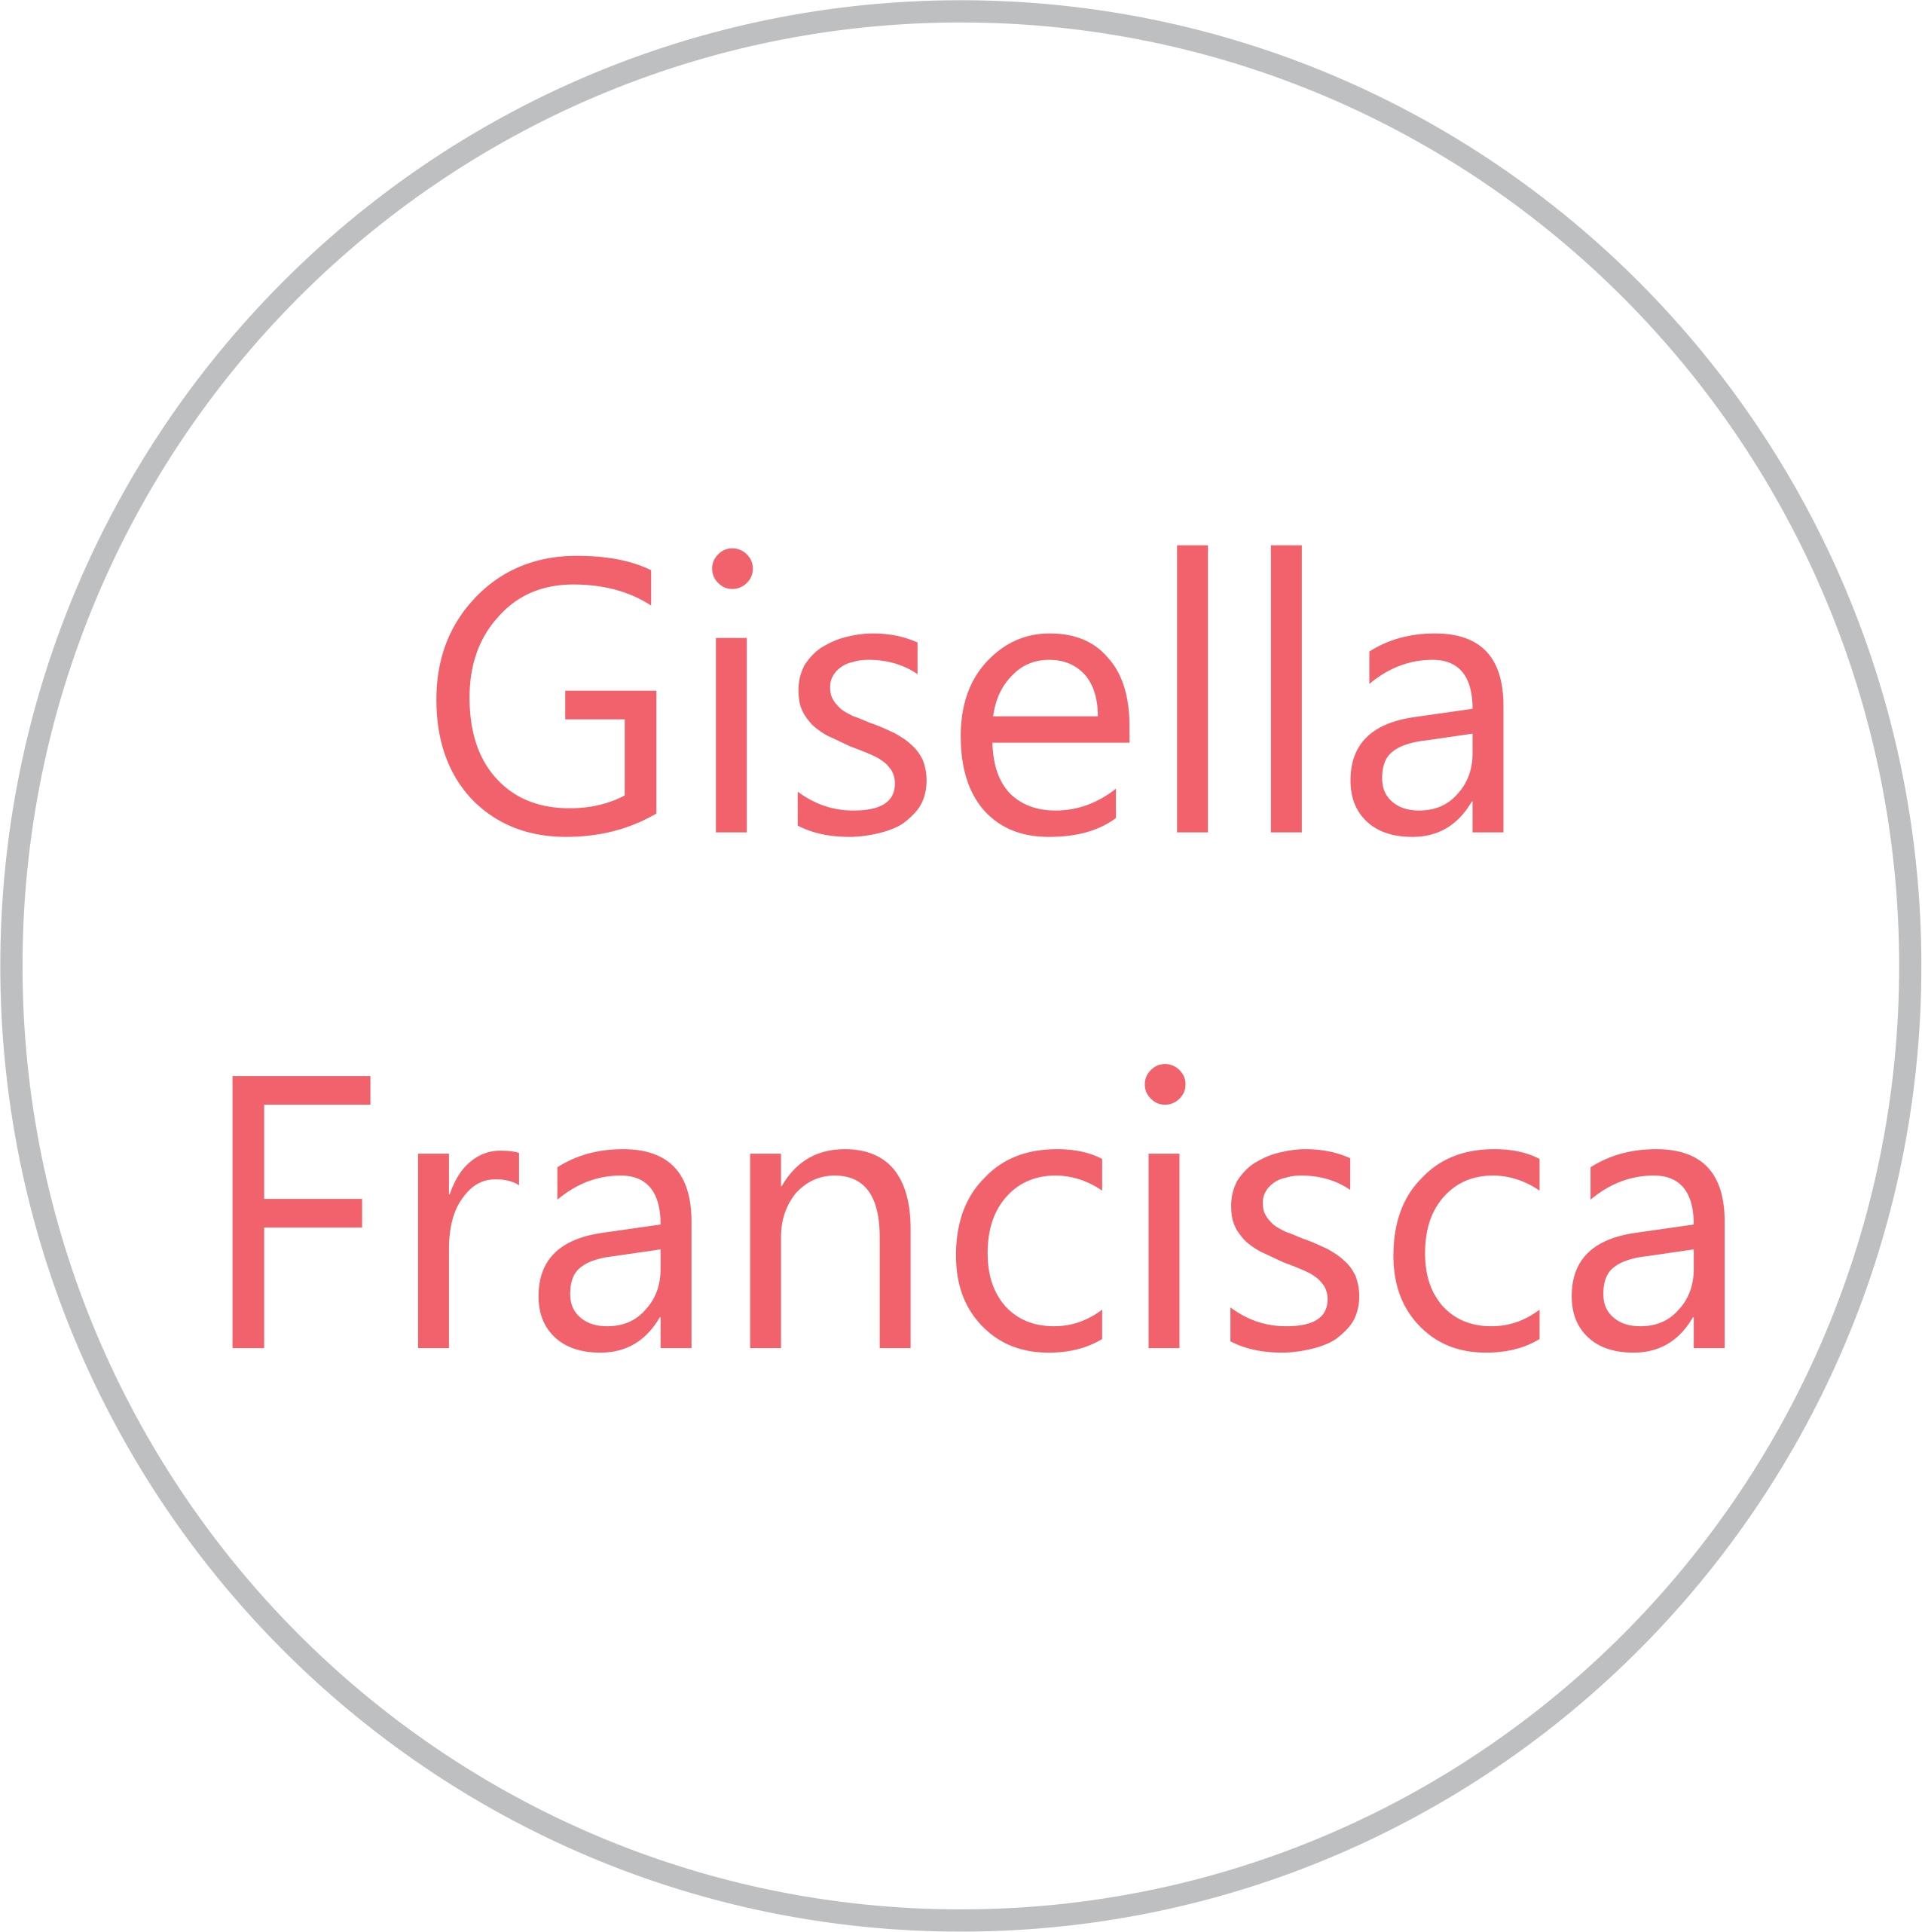 Gisella Francisca